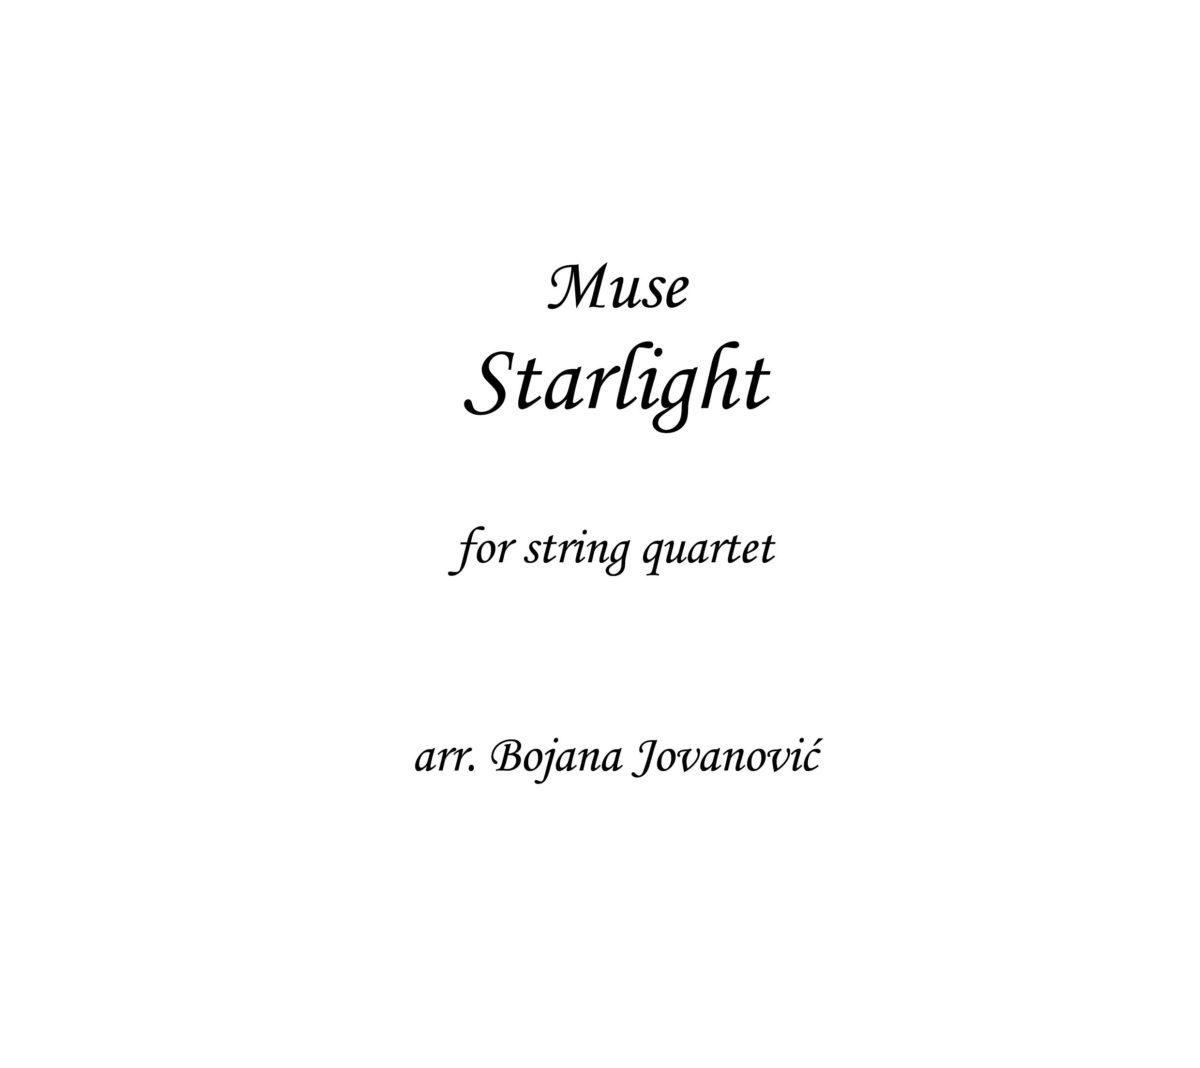 Starlight (Muse) - Sheet Music